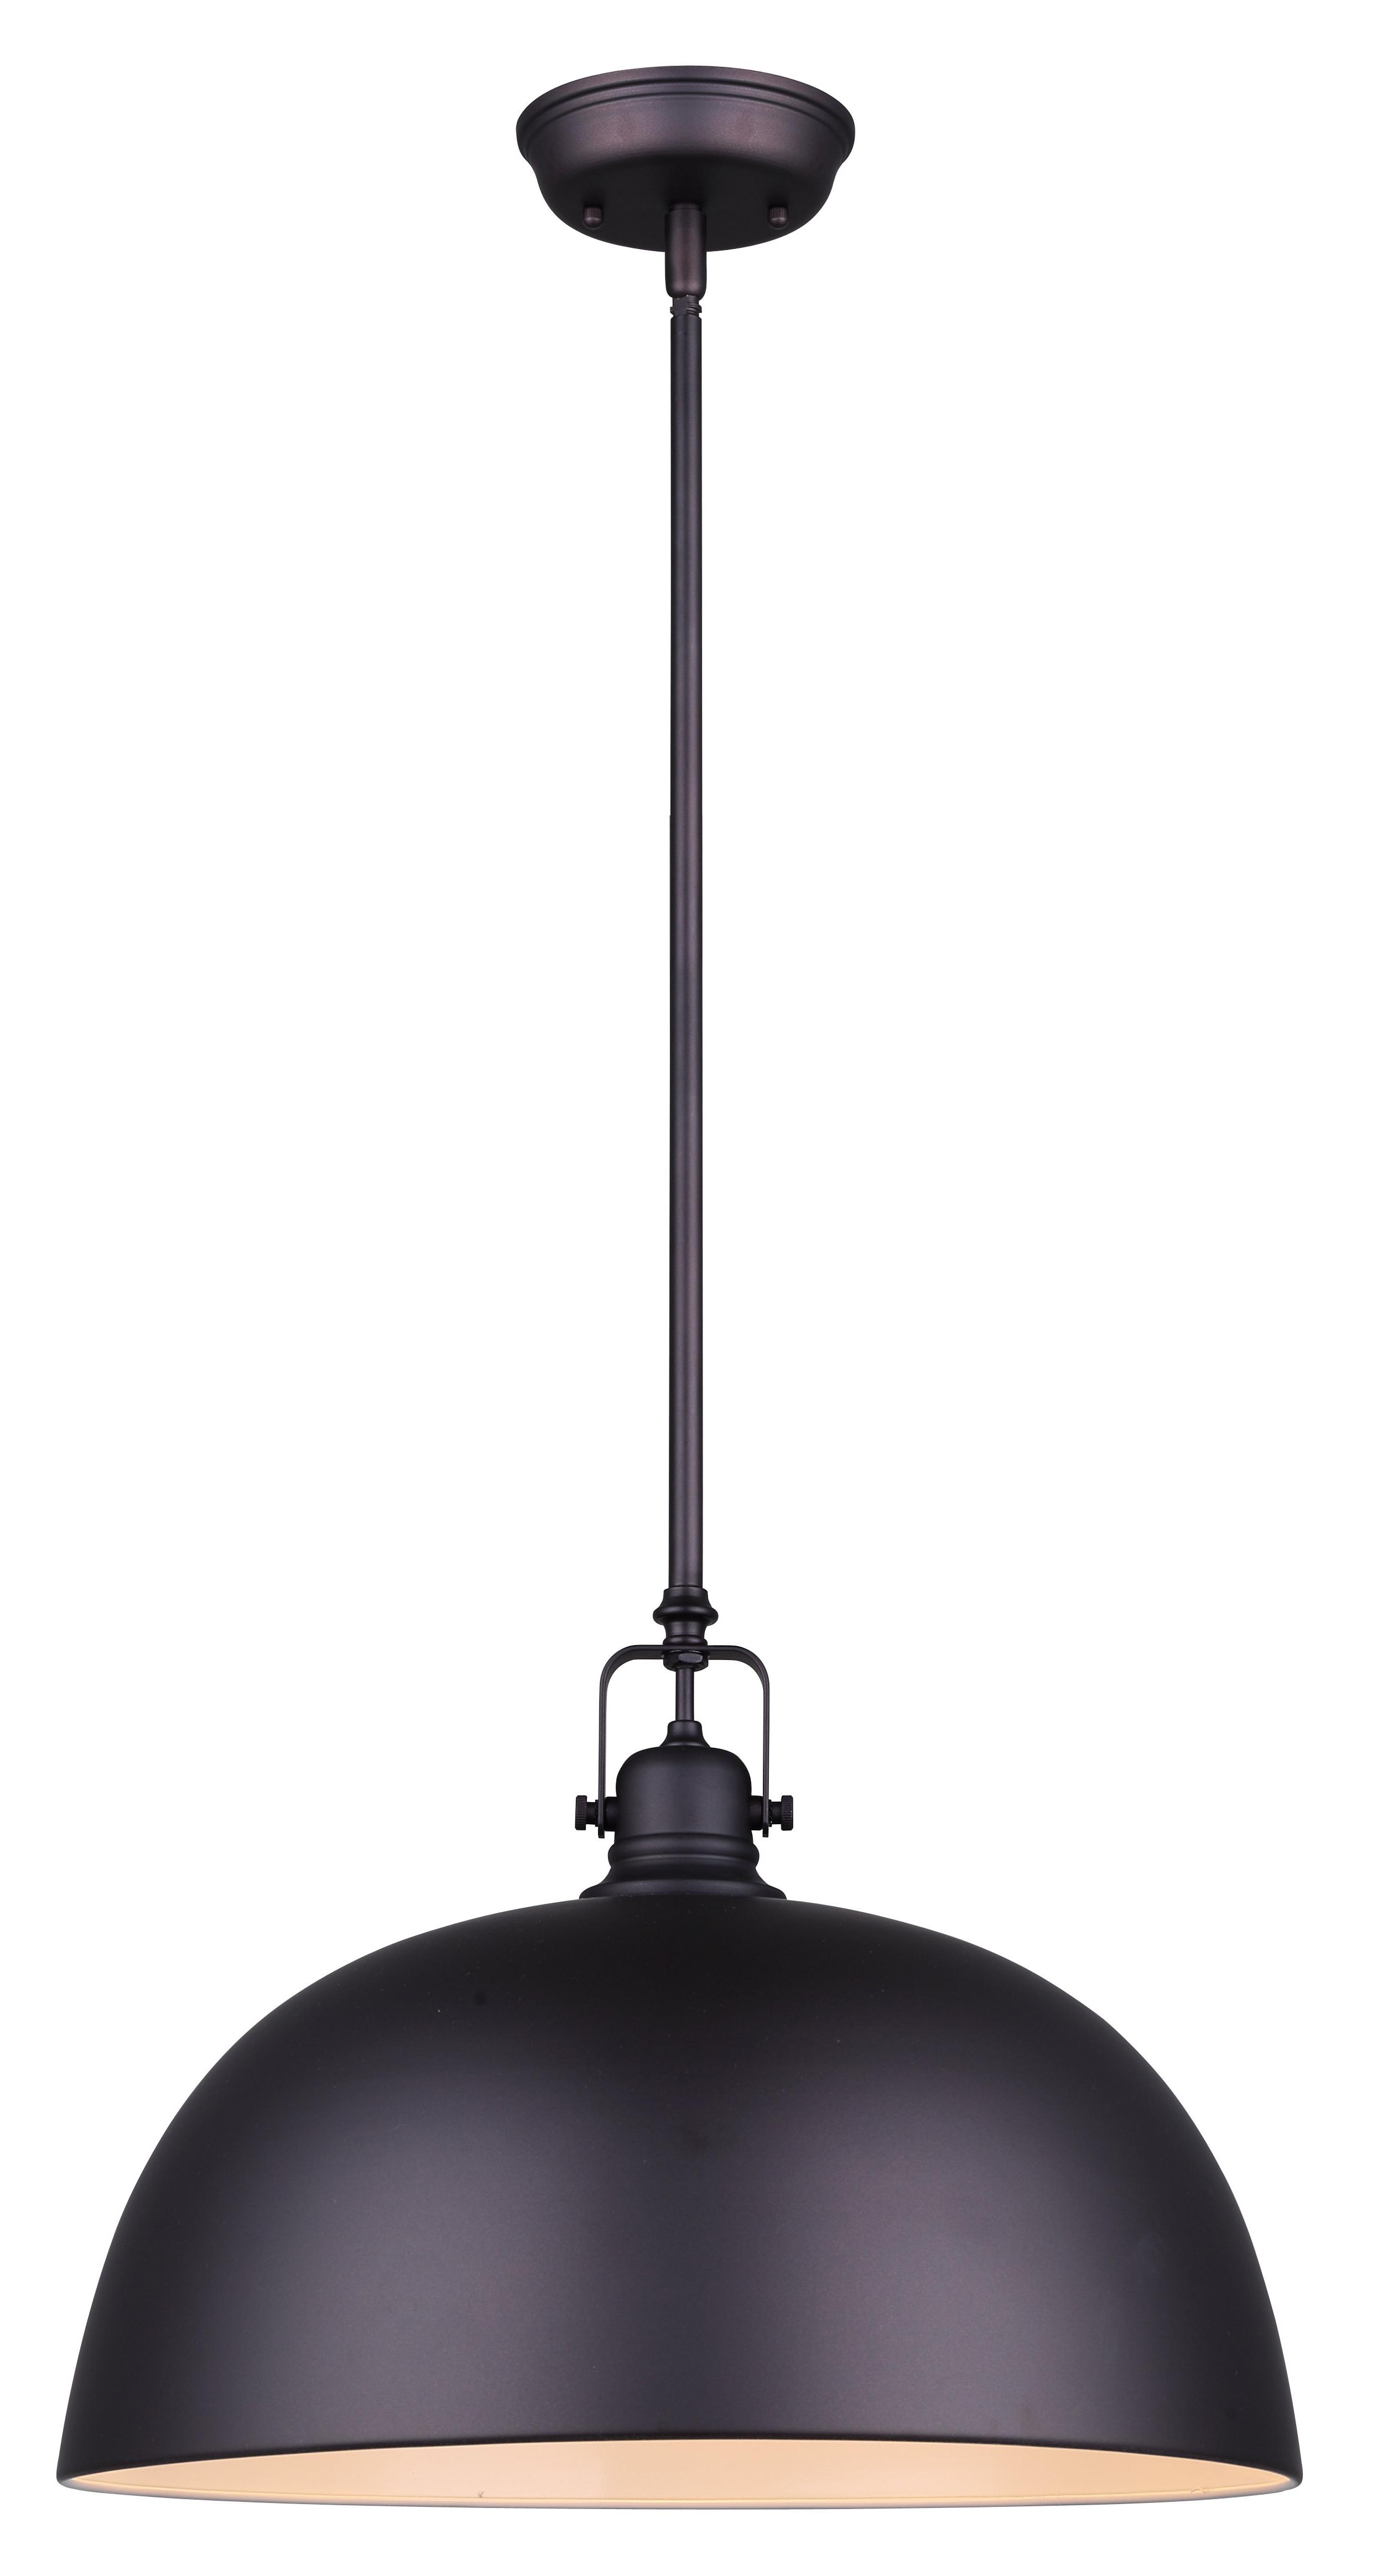 Emaria 3-Light Single Drum Pendants pertaining to Latest Southlake 1-Light Single Dome Pendant